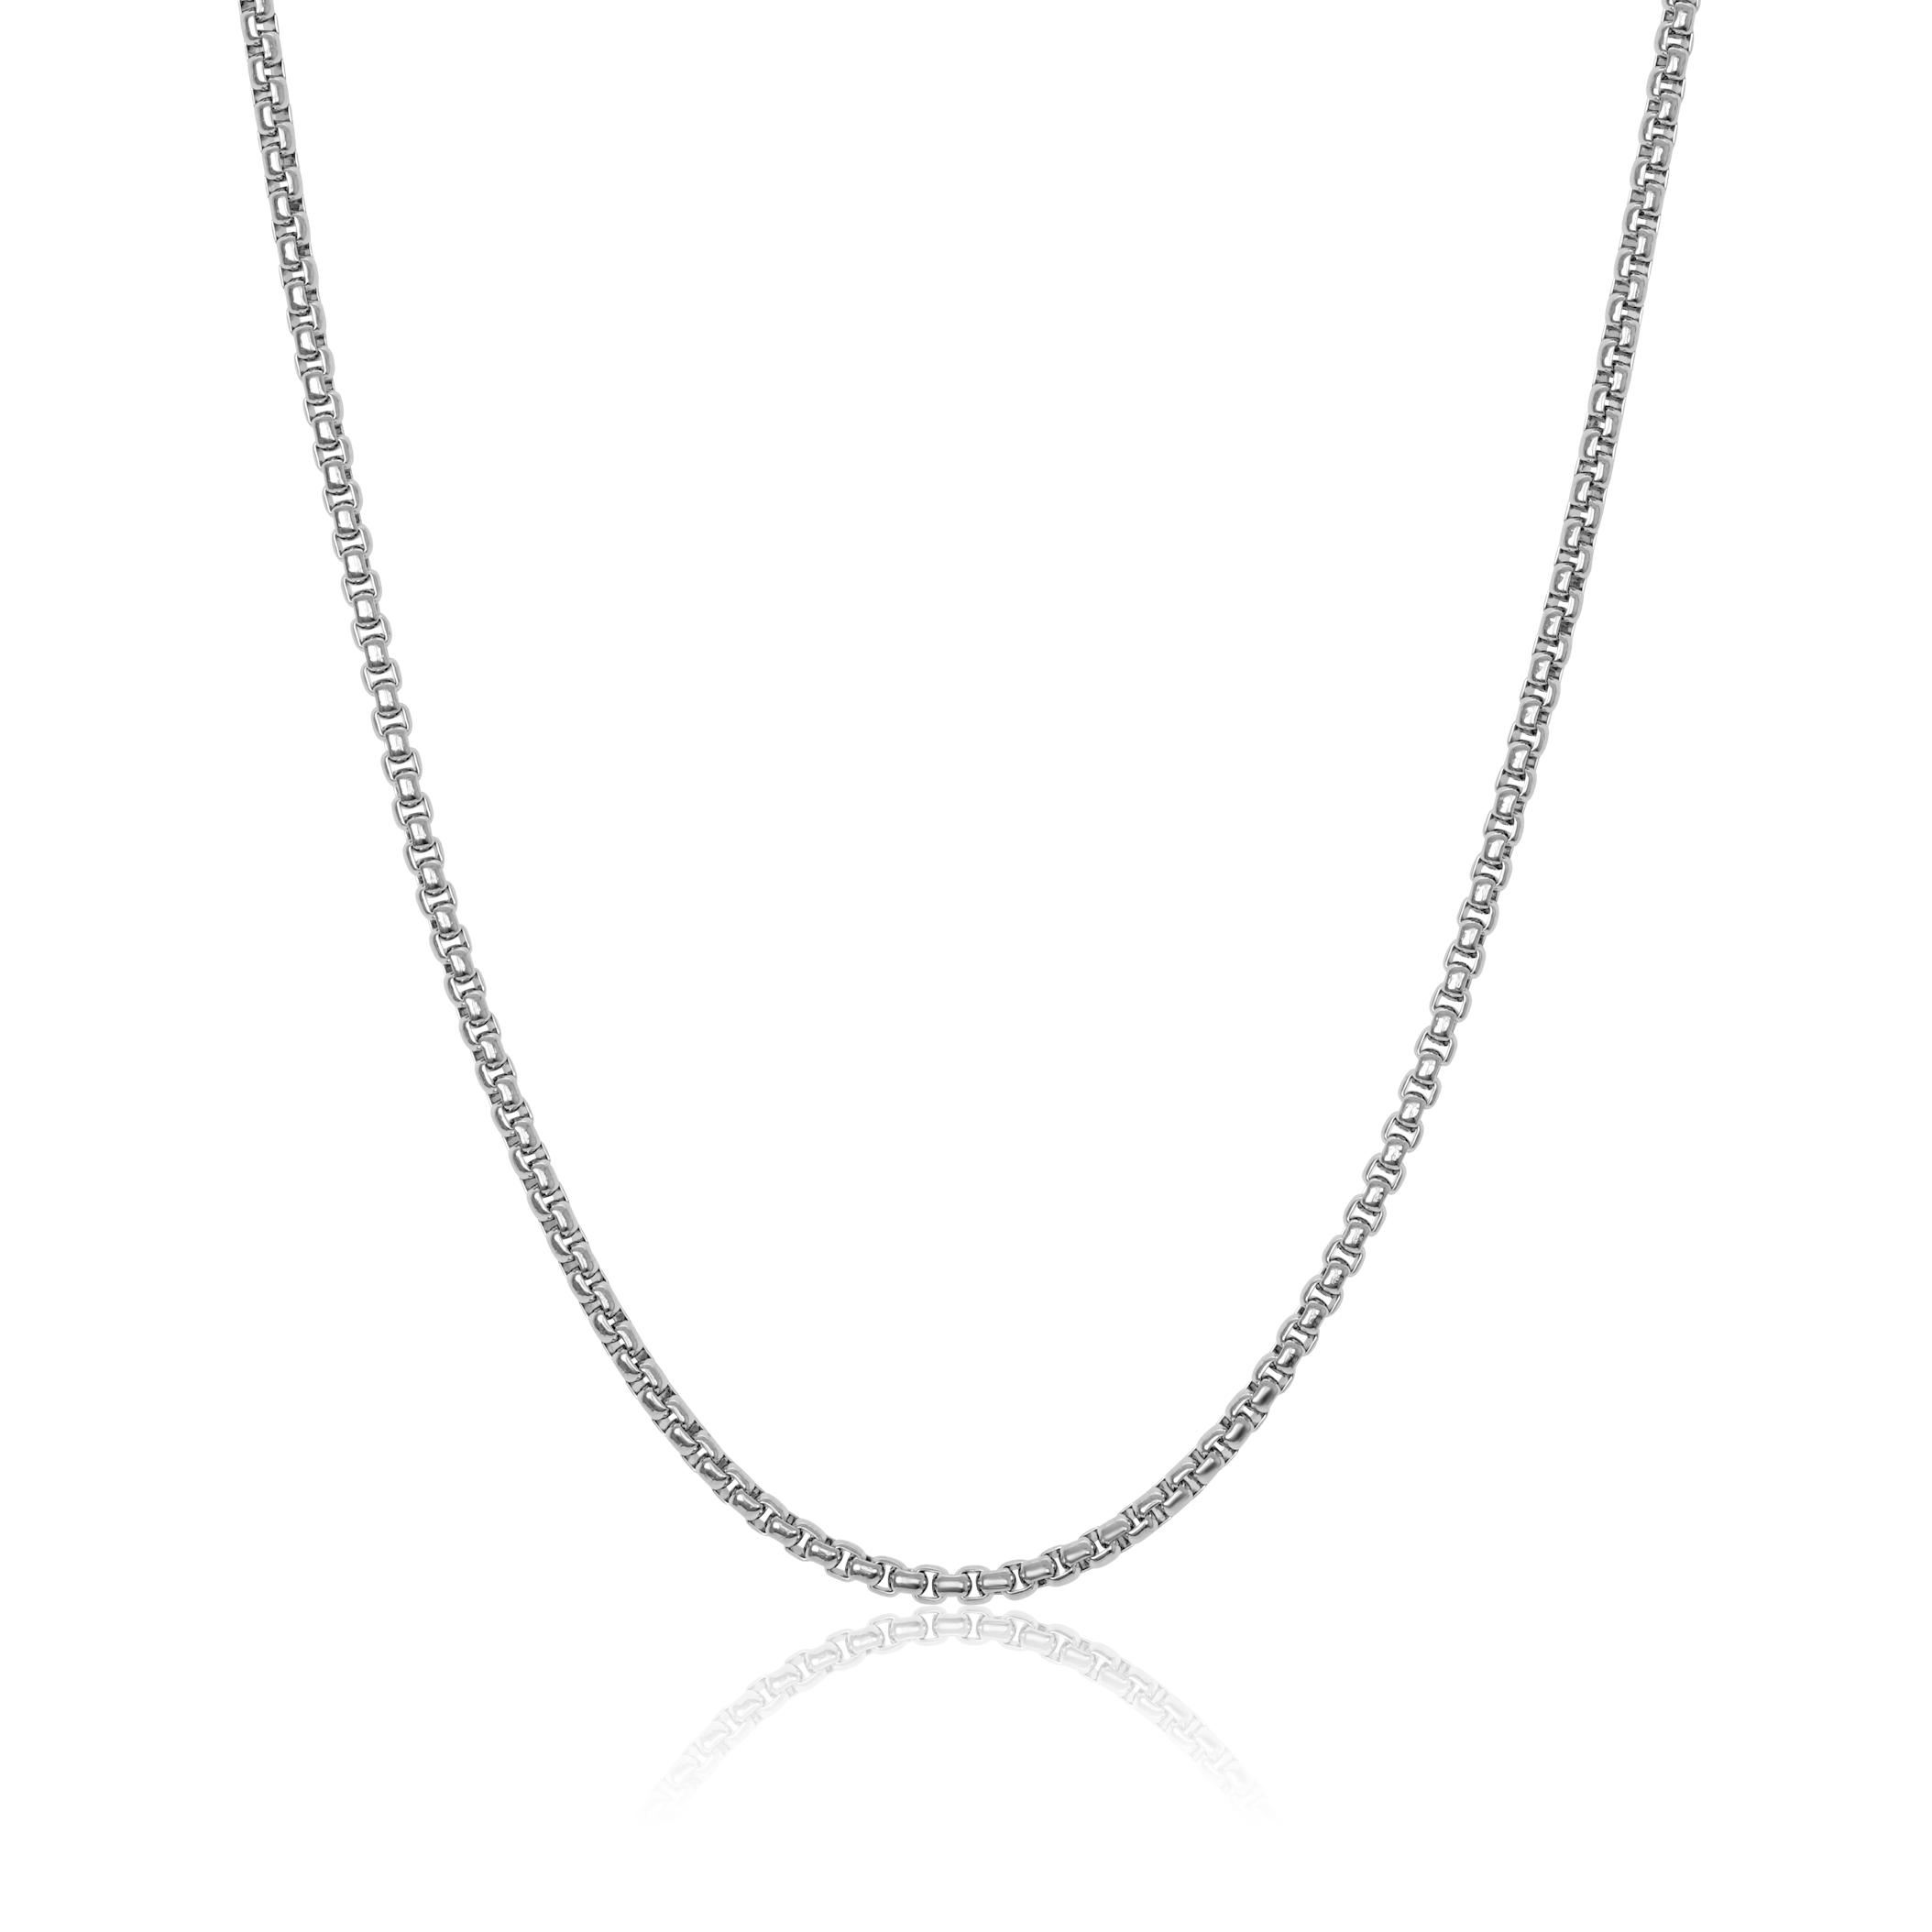 22'' Round box chain - Stainless steel